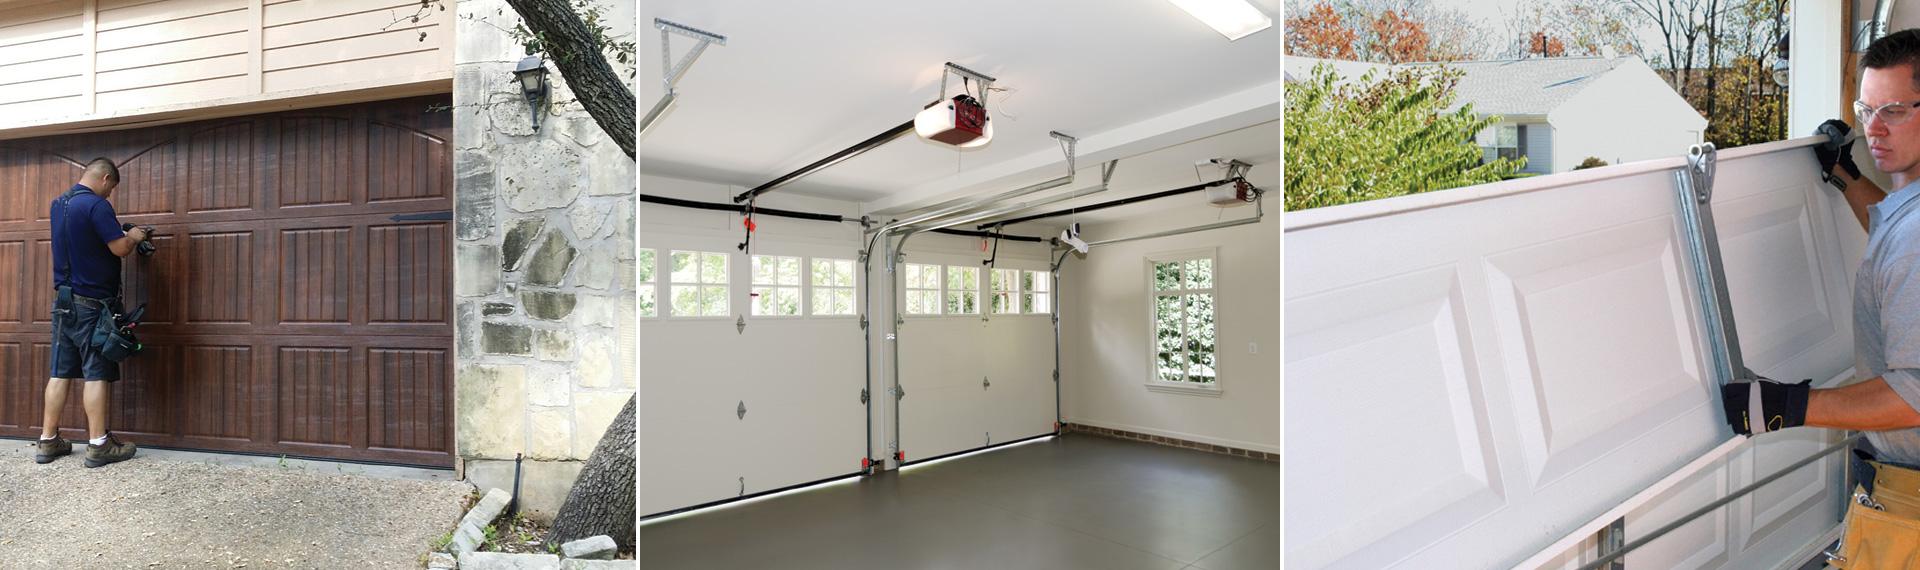 All Garage Door Services Springfield PA